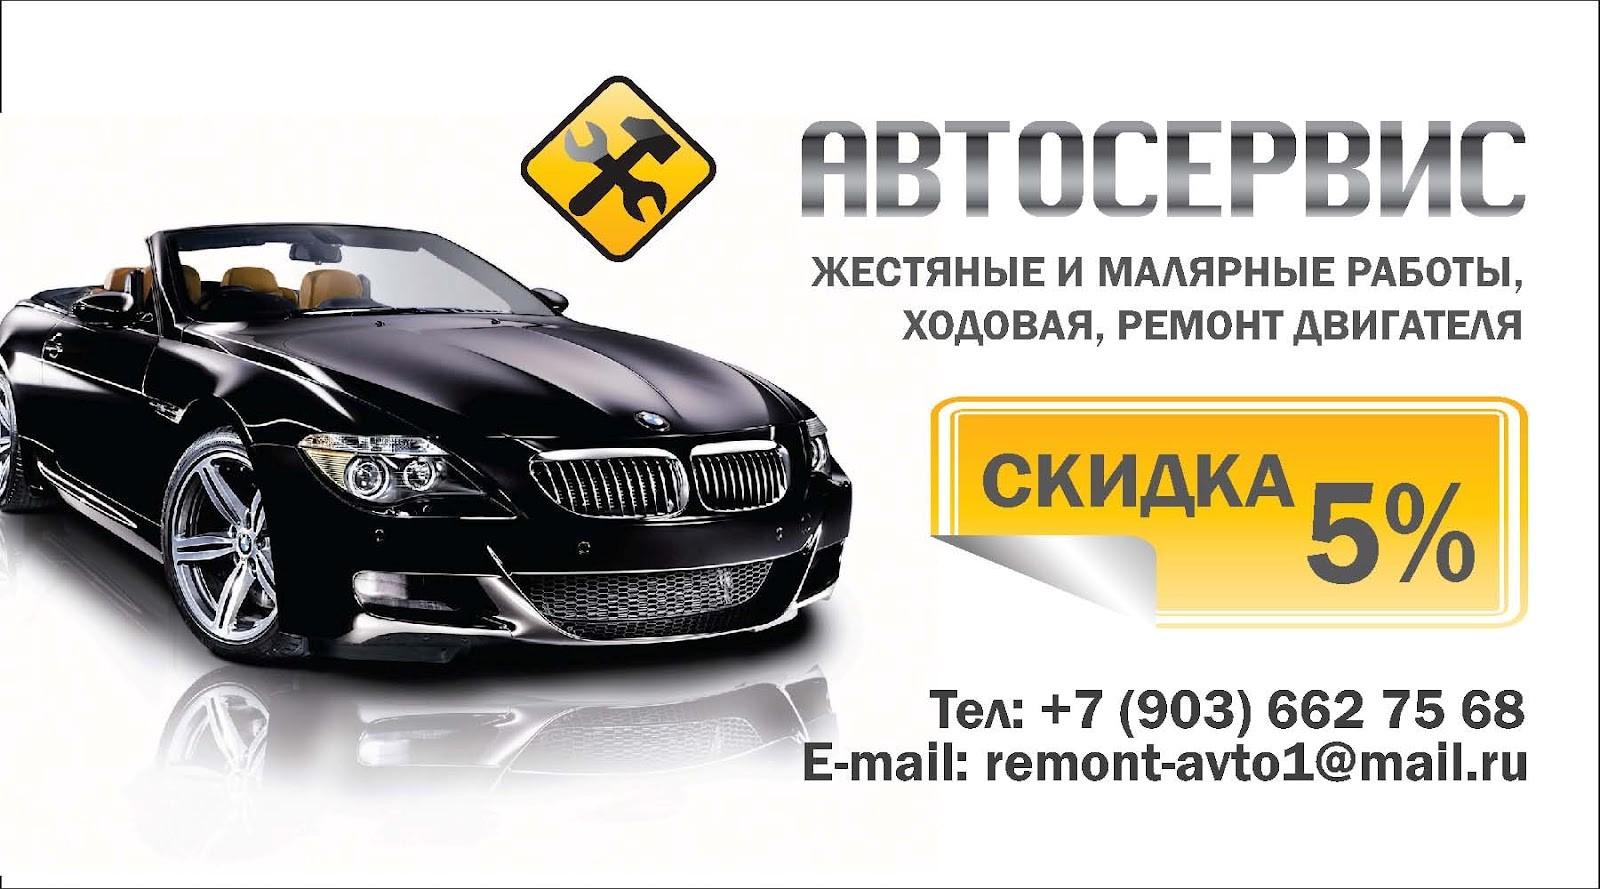 Визитки для автосервиса в Москве | фото 8